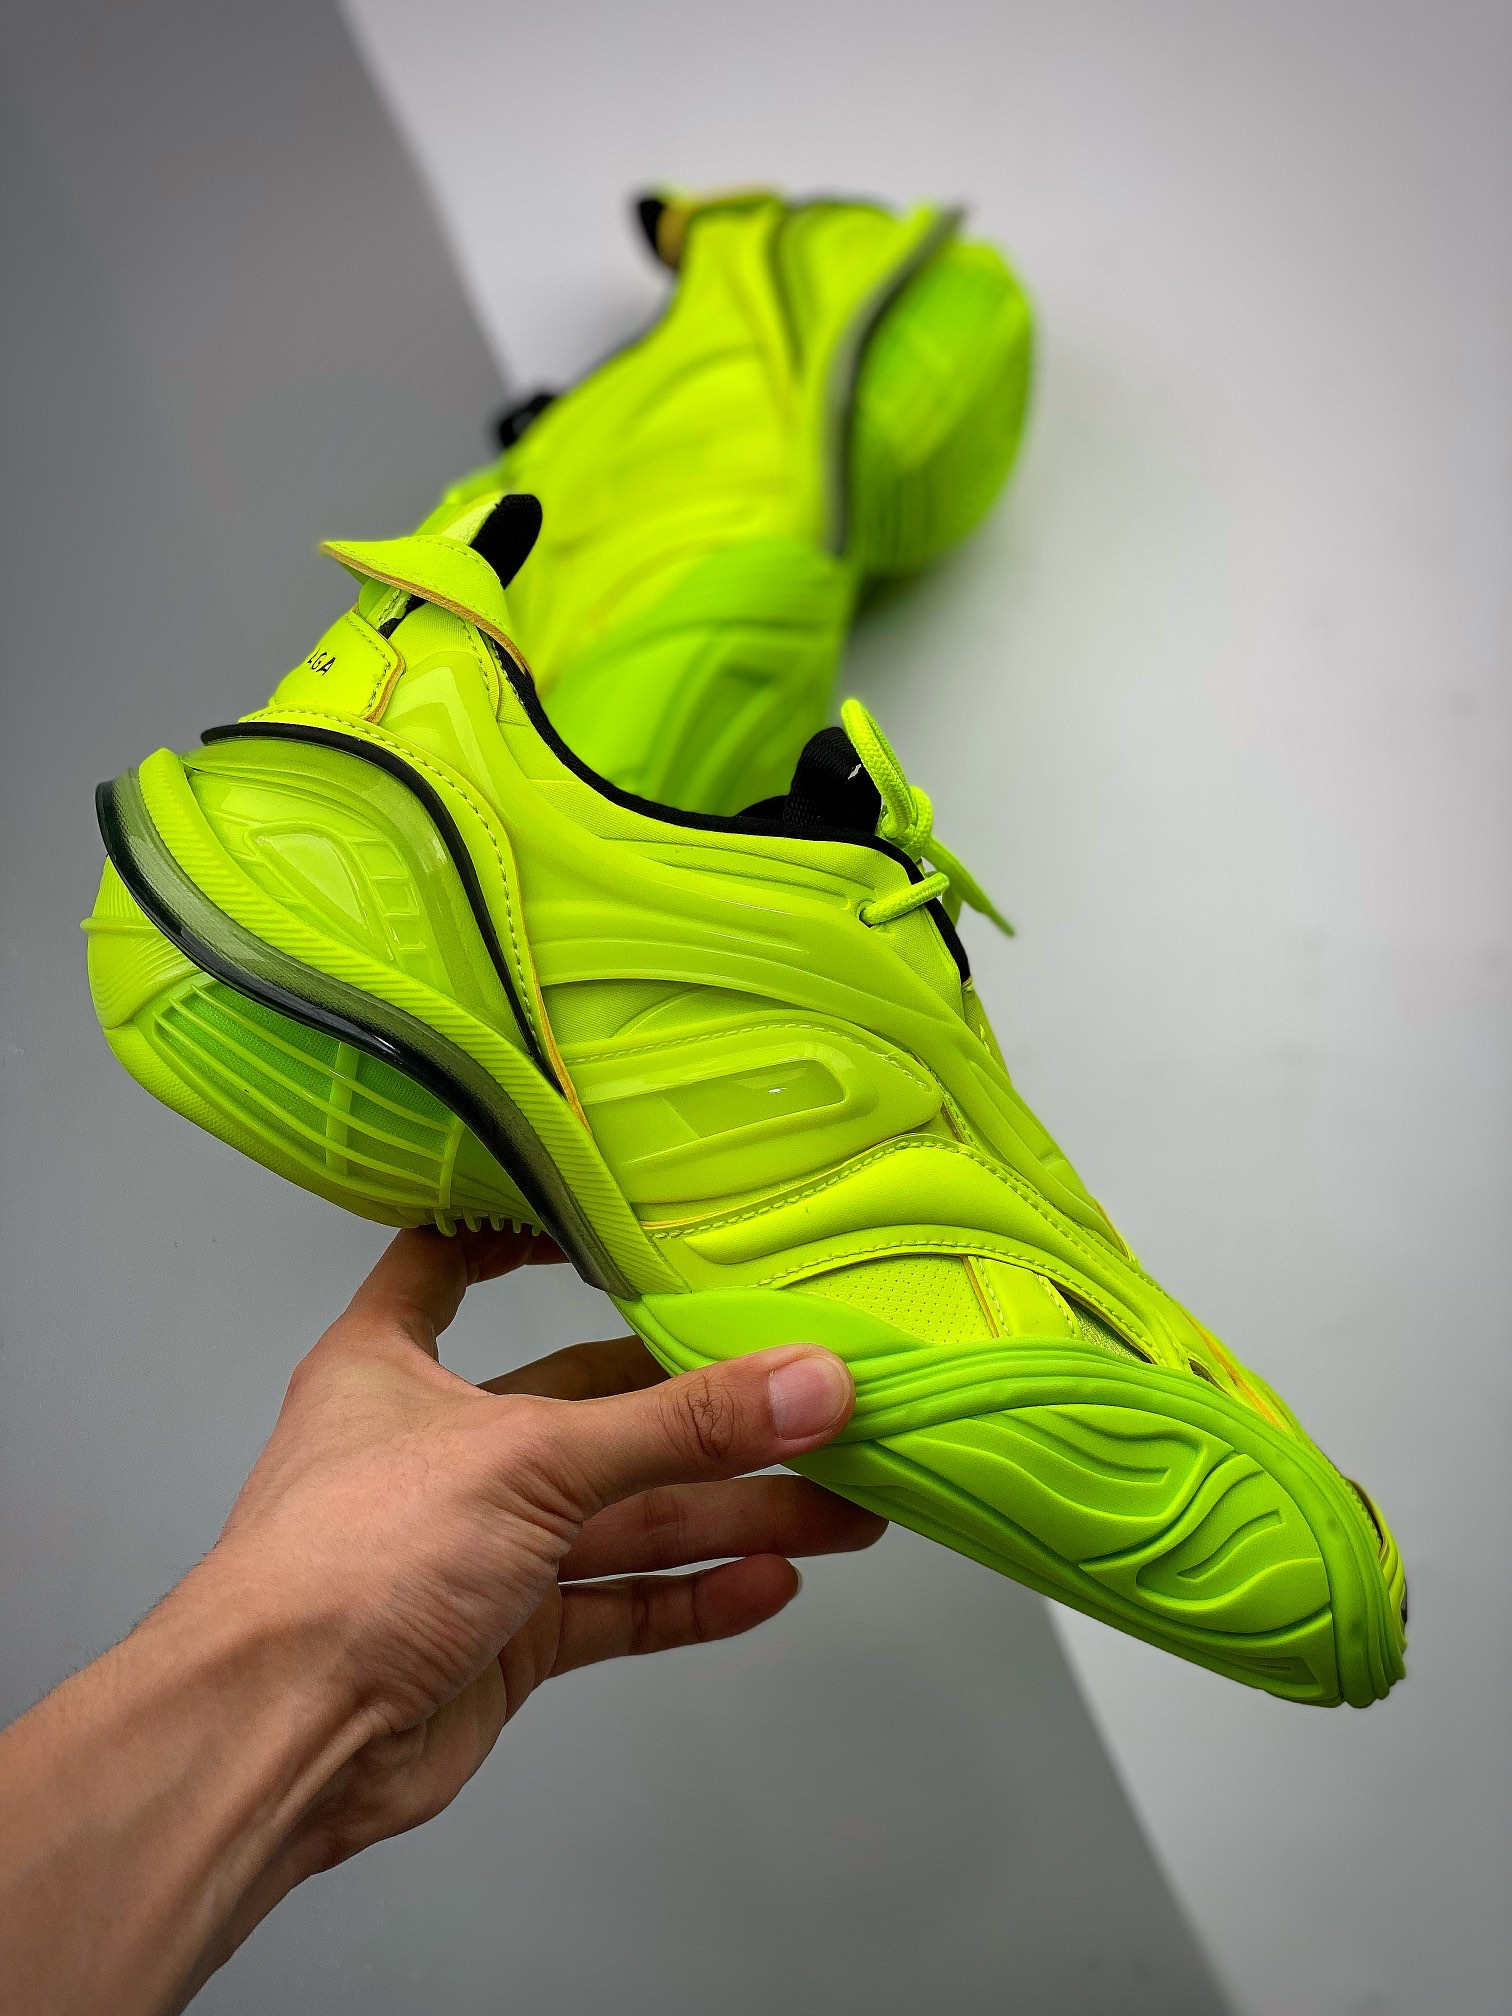 Balenciaga Runway Tyrex  Panelled Trainers巴黎世家20ss_郴州裸鞋跟河源裸鞋